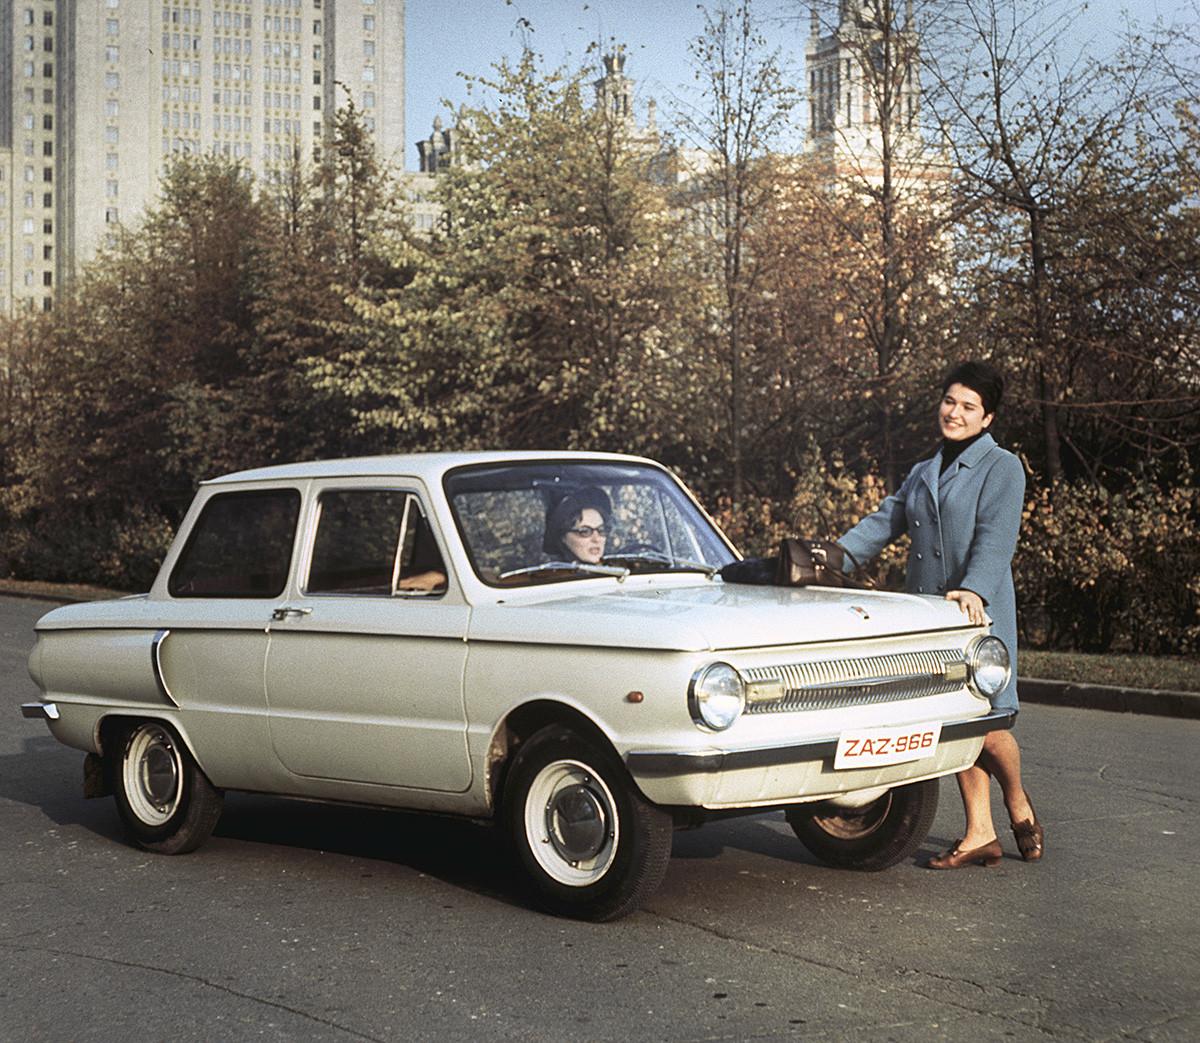 ZAZ-966 buatan Pabrik Otomotif Zaporozhye (lebih dikenal sebagai Zaporozhets) keluaran tahun 1970.